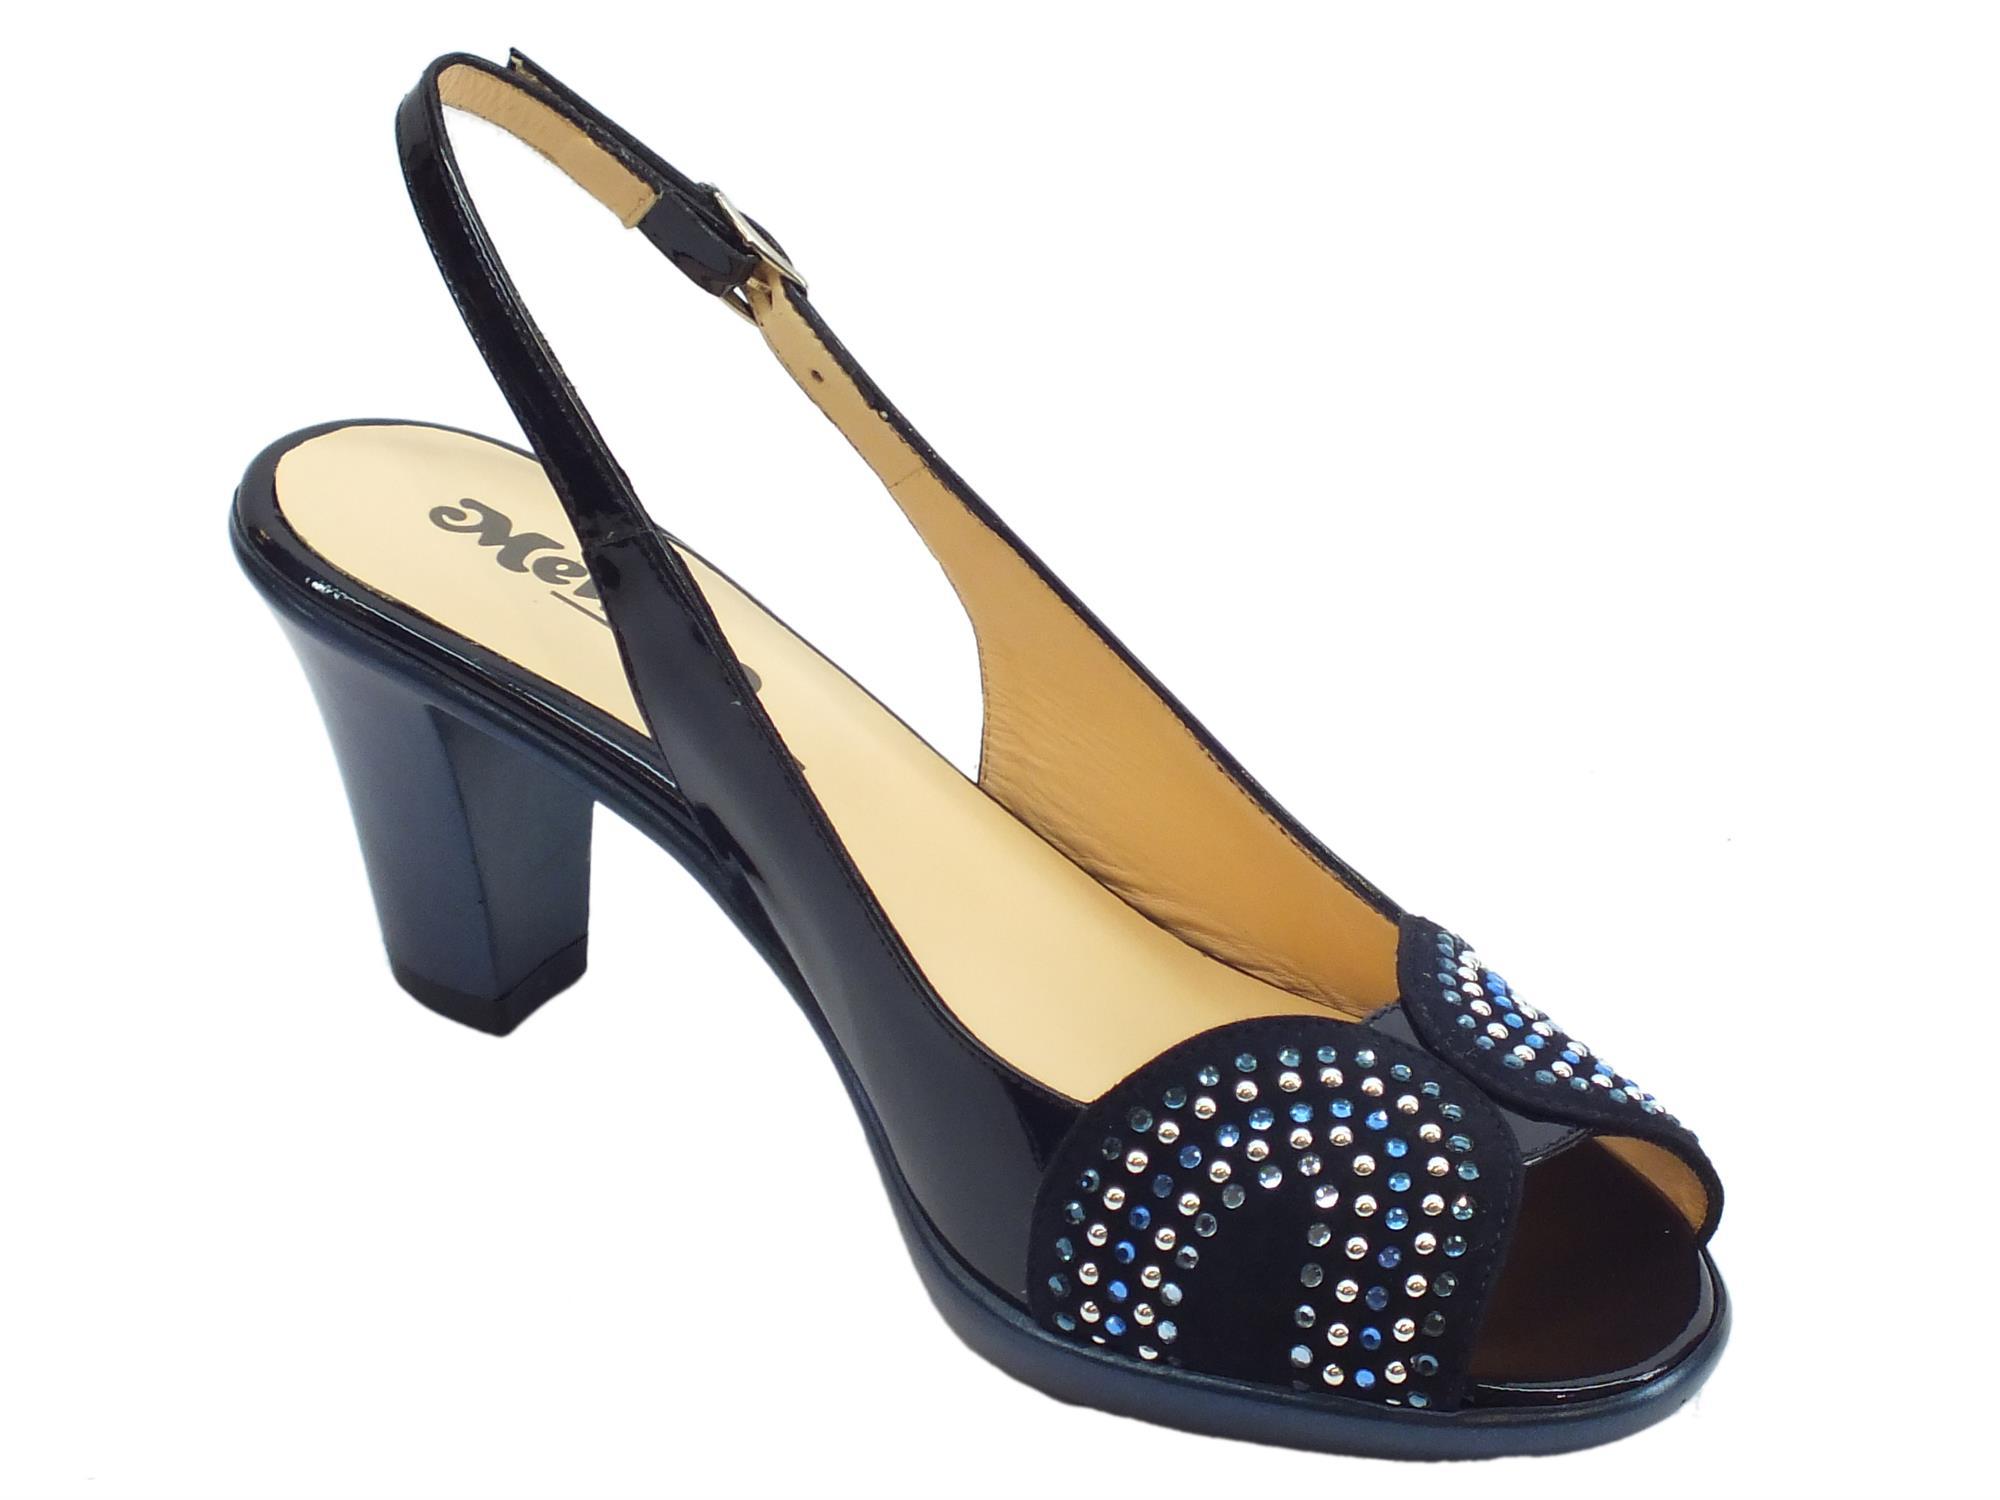 b9ecea80a3ca1 Sandali Melluso donna vernice nabuk blu tacco alto - Vitiello Calzature